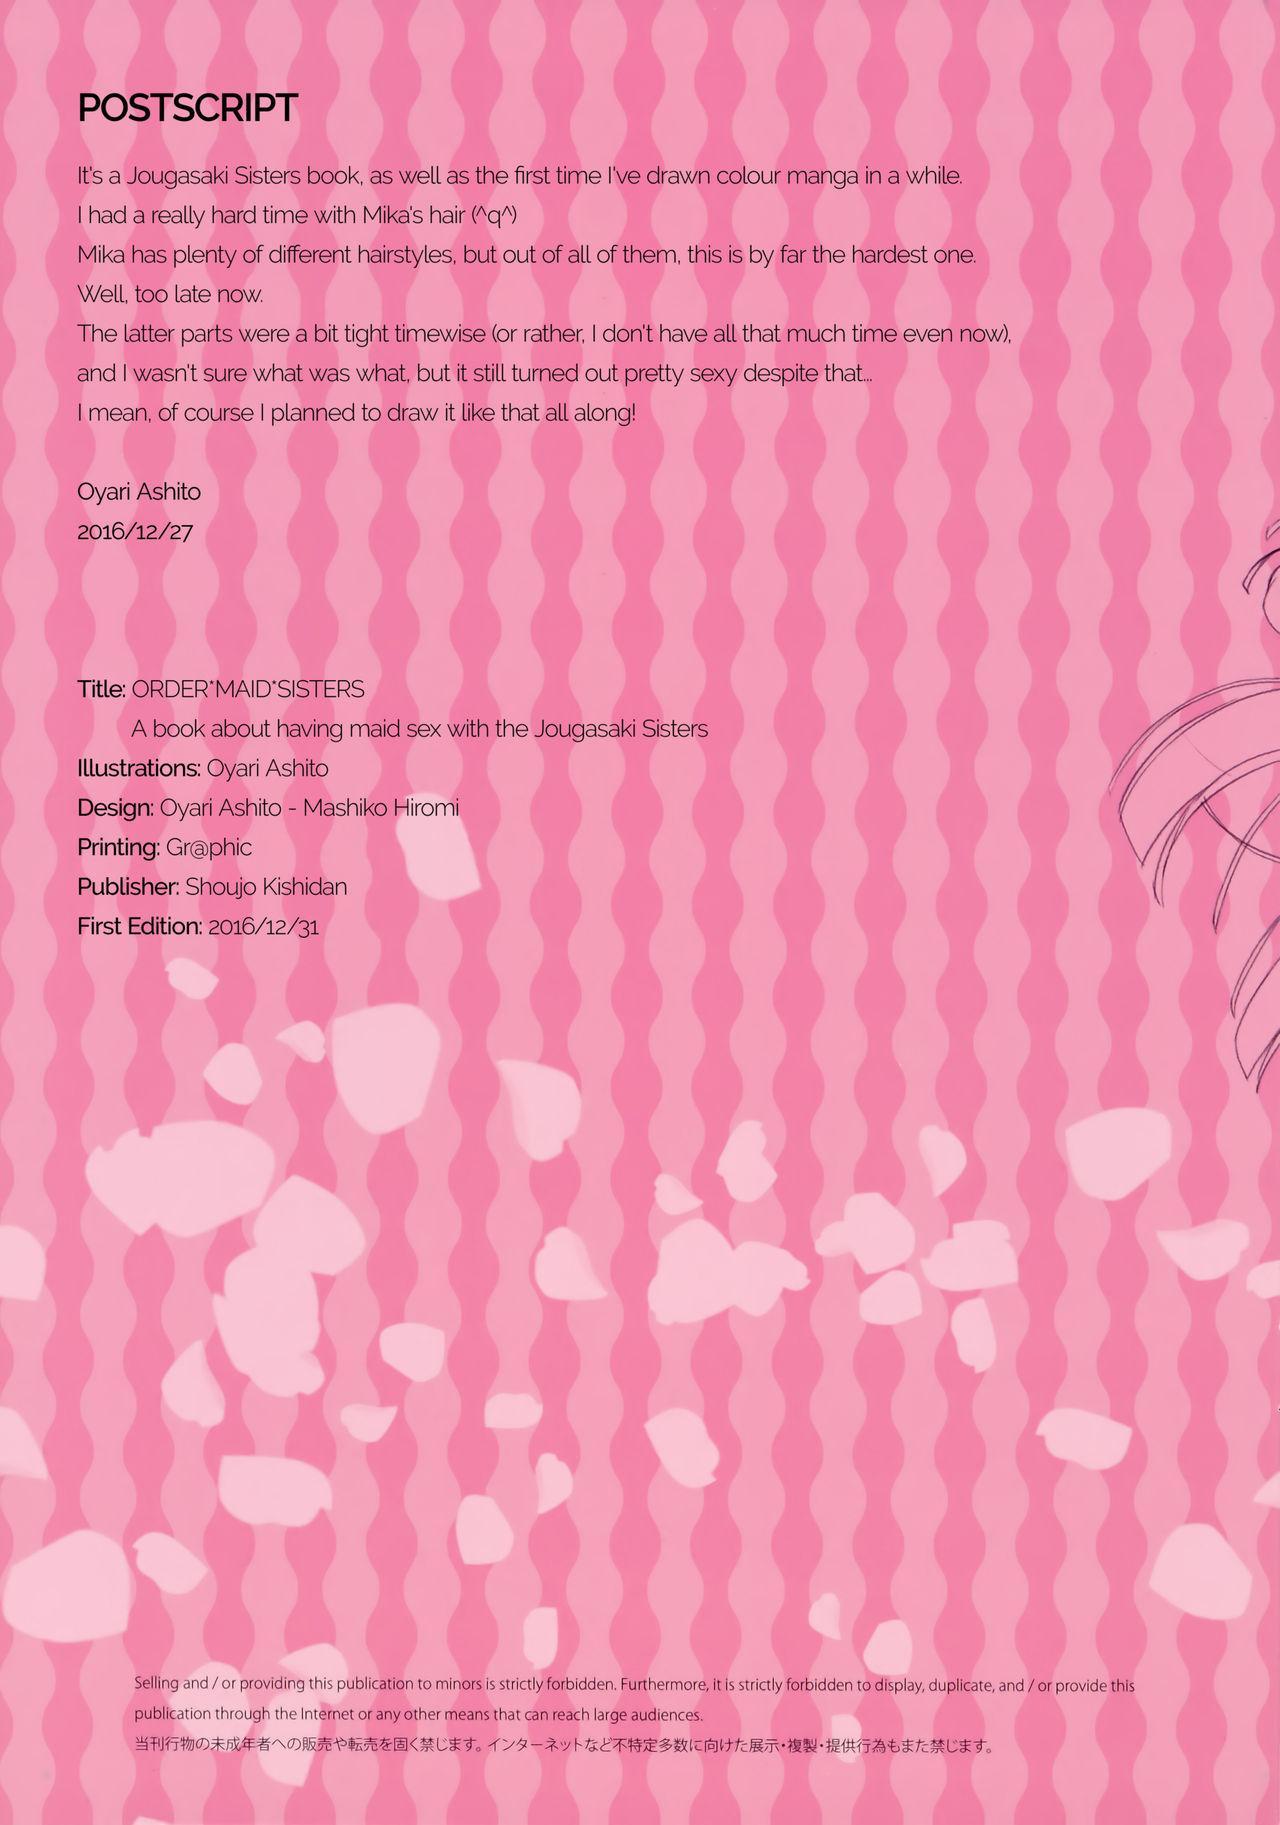 ORDER*MAID*SISTERS Jougasaki Shimai to Maid SEX Suru Hon   ORDER*MAID*SISTERS - A book about having maid sex with the Jougasaki Sisters 27